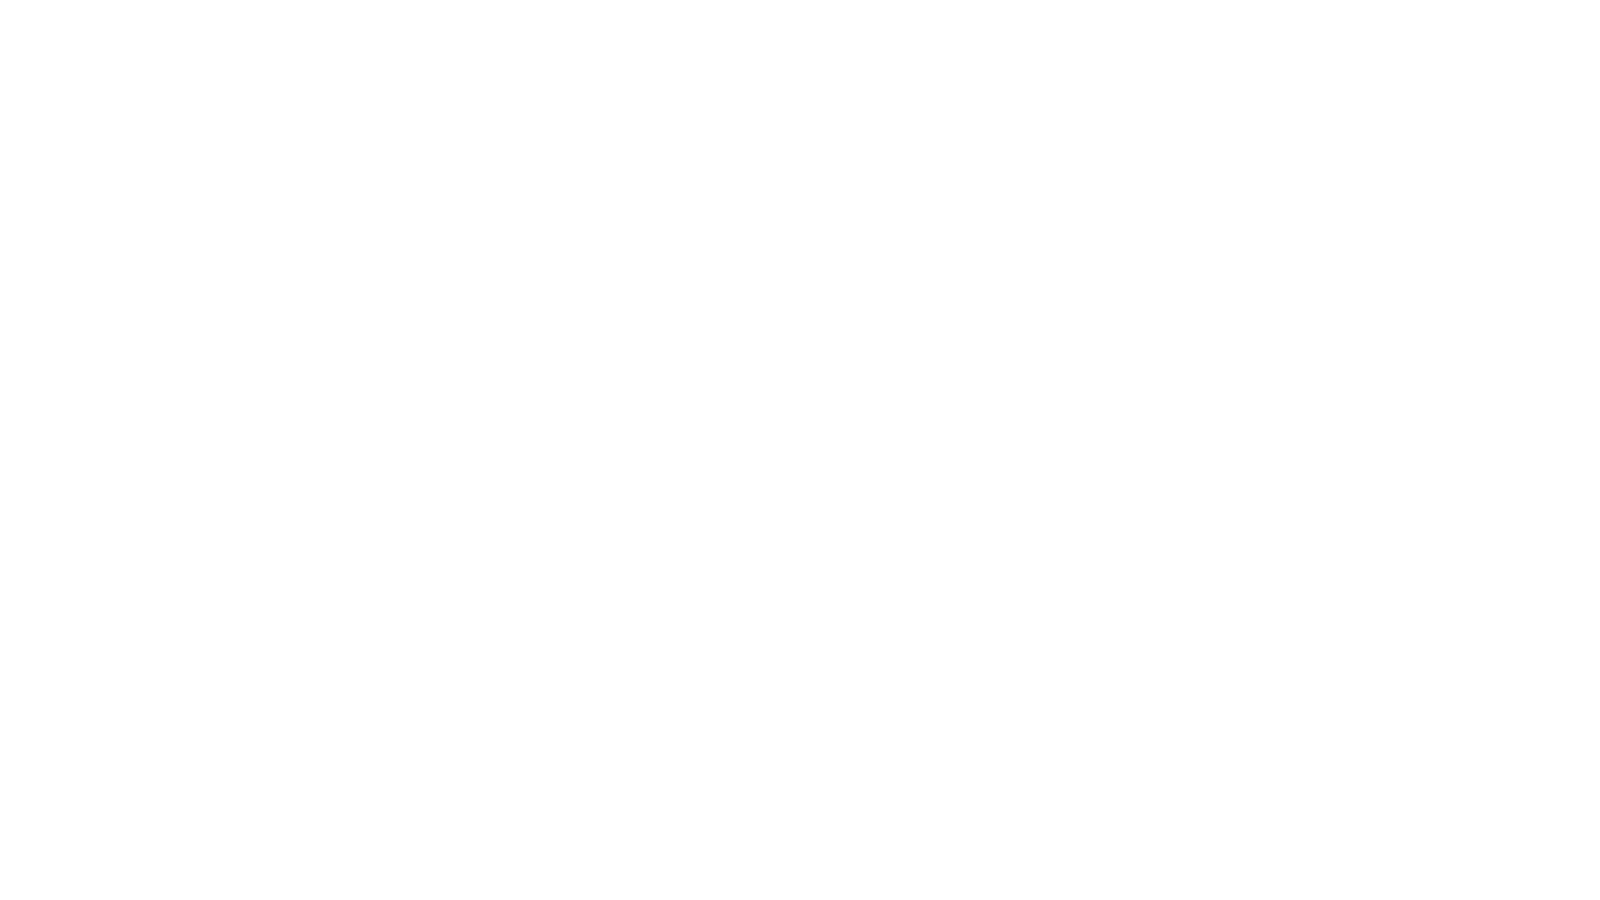 Dandimite OFFICIAL SITE & WEB SHOP https://dandimite.sandalista.net  TITLE : sideA その道のプロ / sideAA きっと今夜もNICE&SWEET レーベル : X-plotion 価格 : 1500円(税別) 発売日 : 2021年9月1日  ▫️収録曲  SIDE A : その道のプロ / KEY-ROCK & DANDIMITE (Riddim,Mix,Mastering : Studio Chelsea)  SIDE AA : きっと今夜もNICE&SWEET / KID-RAT & DANDIMITE (Riddim : Takuchaman / Mix,Mastering : Hunter chance studio)